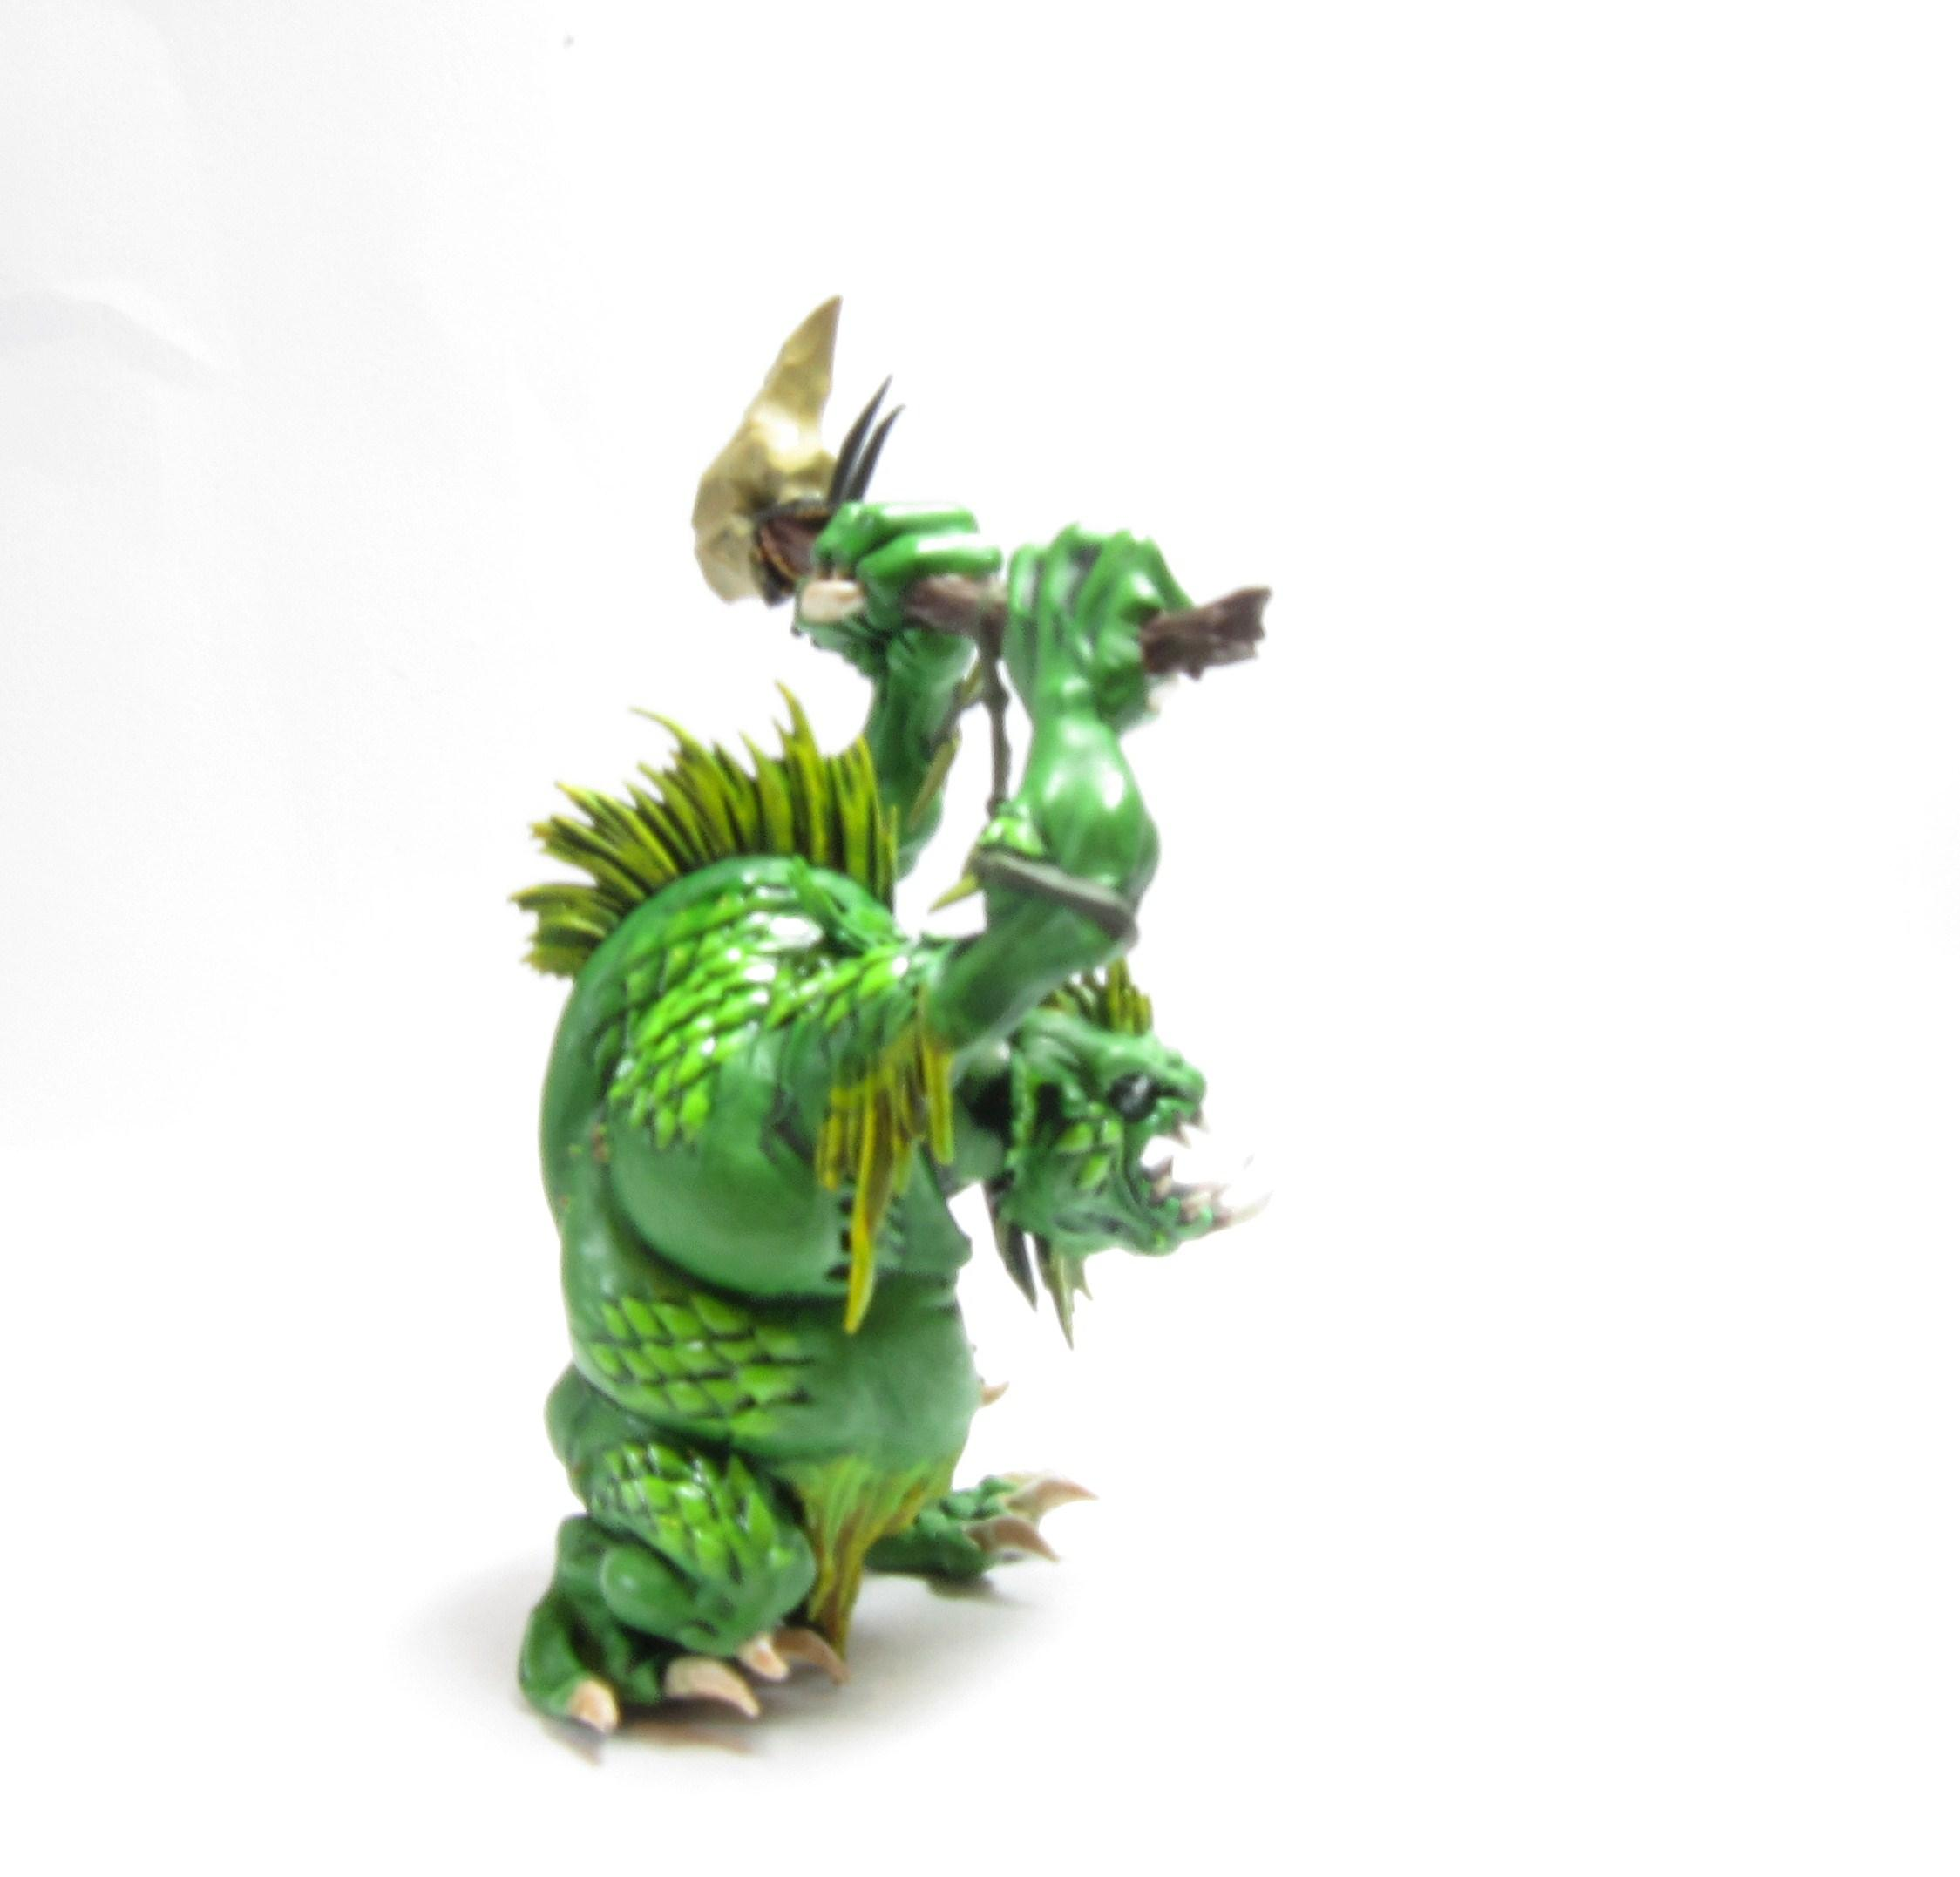 Orcs And Goblins, River Troll, Warhammer Fantasy